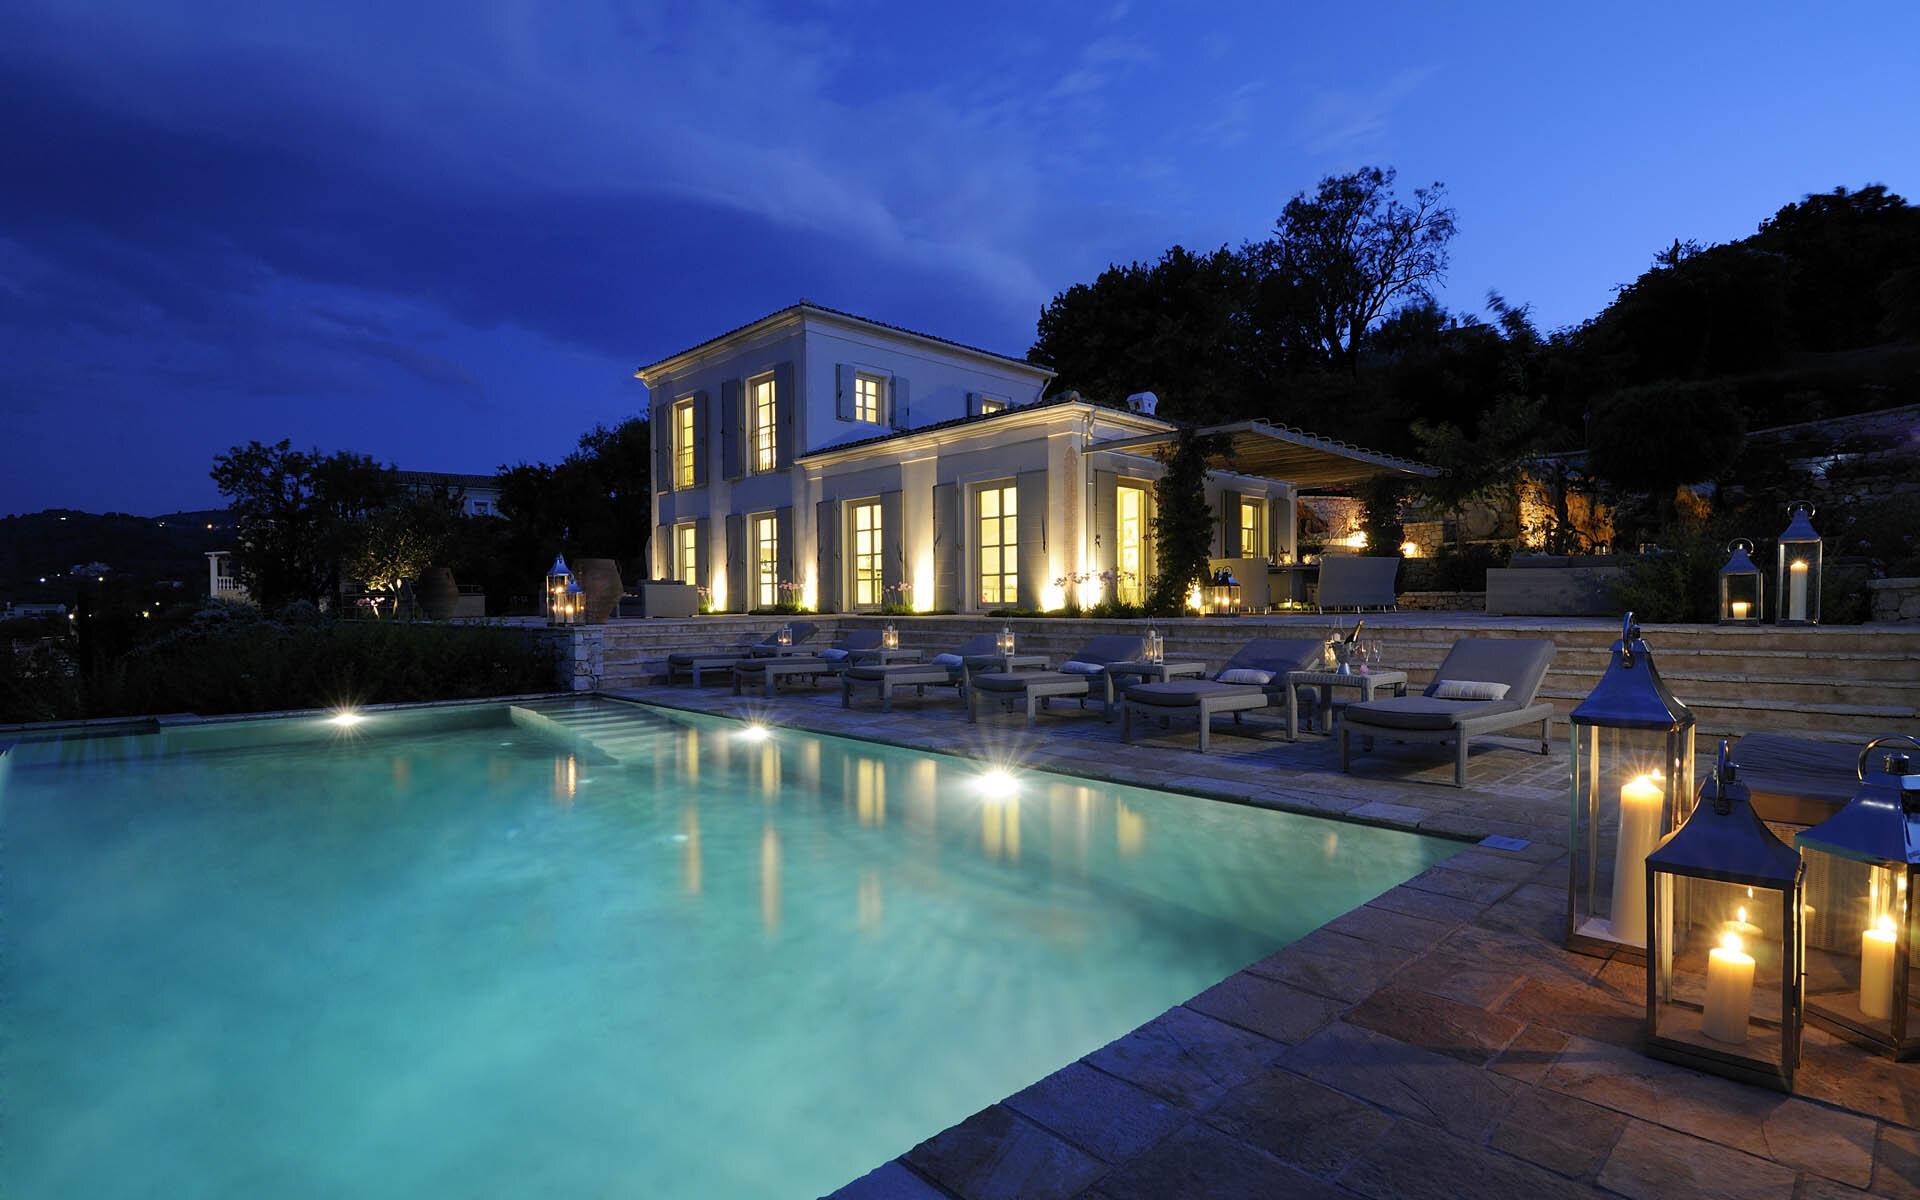 Atolikos House an idyllic corner on the Greek island of Corfu